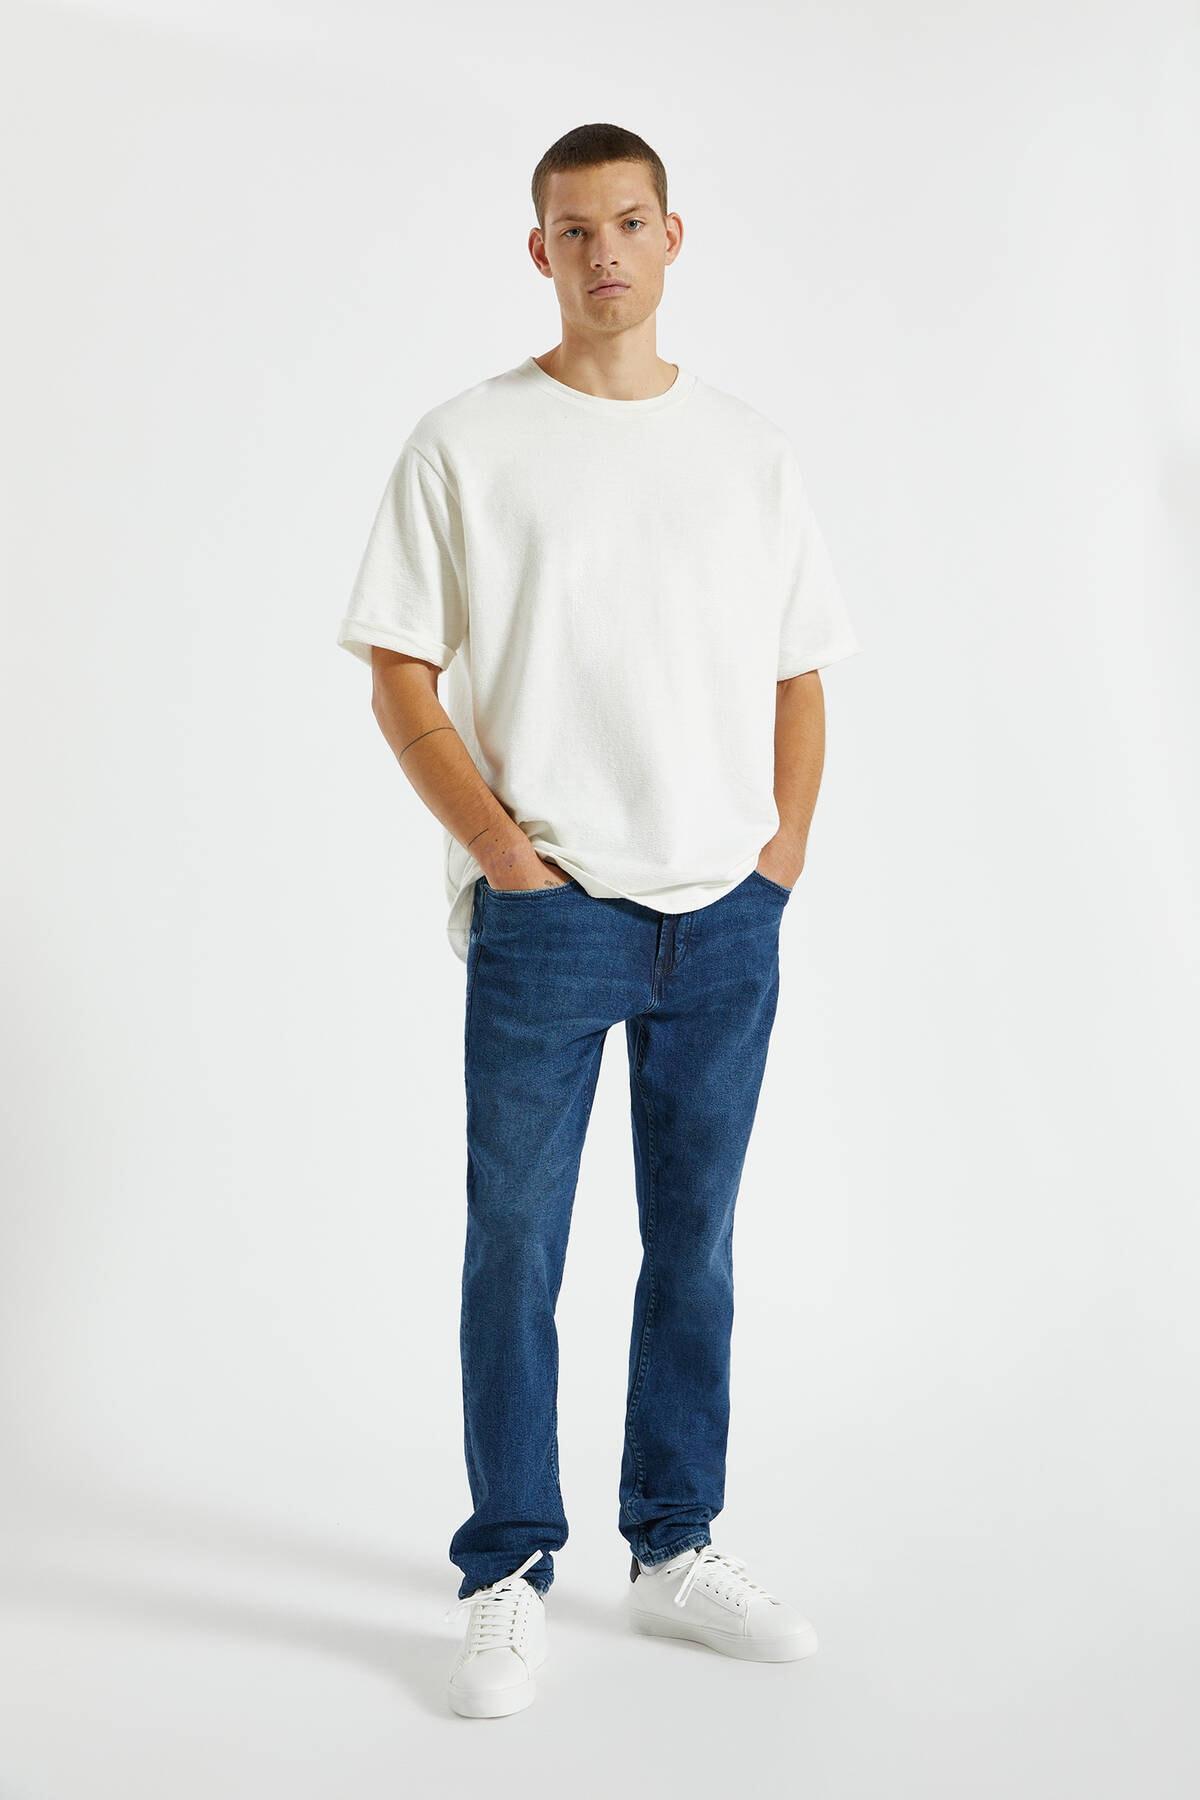 Pull & Bear Erkek Koyu Mavi Comfort Slim Fit Jean 09683530 0